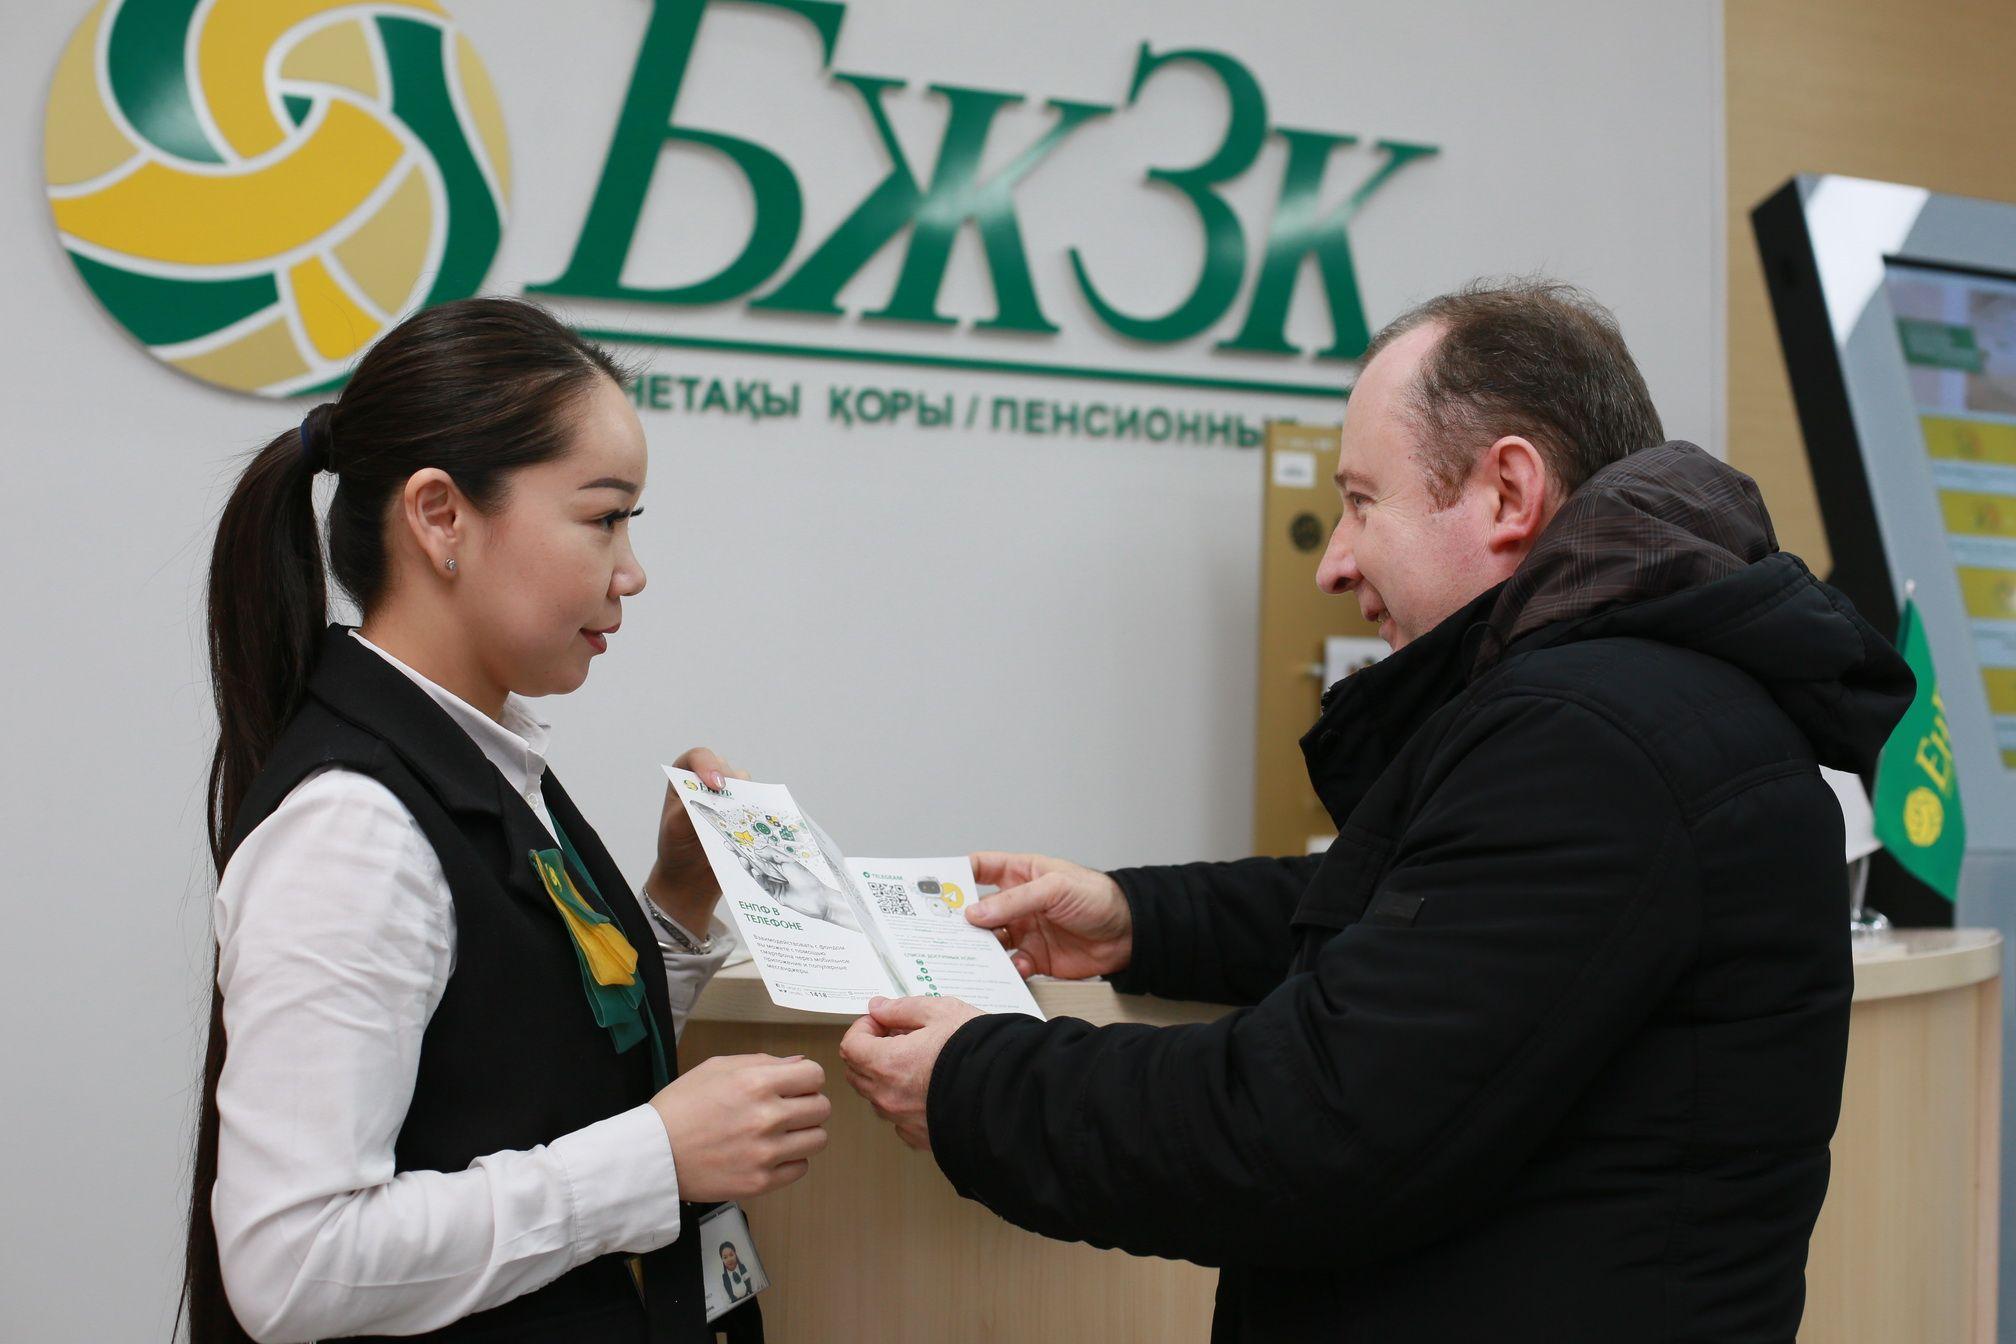 Фото: Руслан Пряников